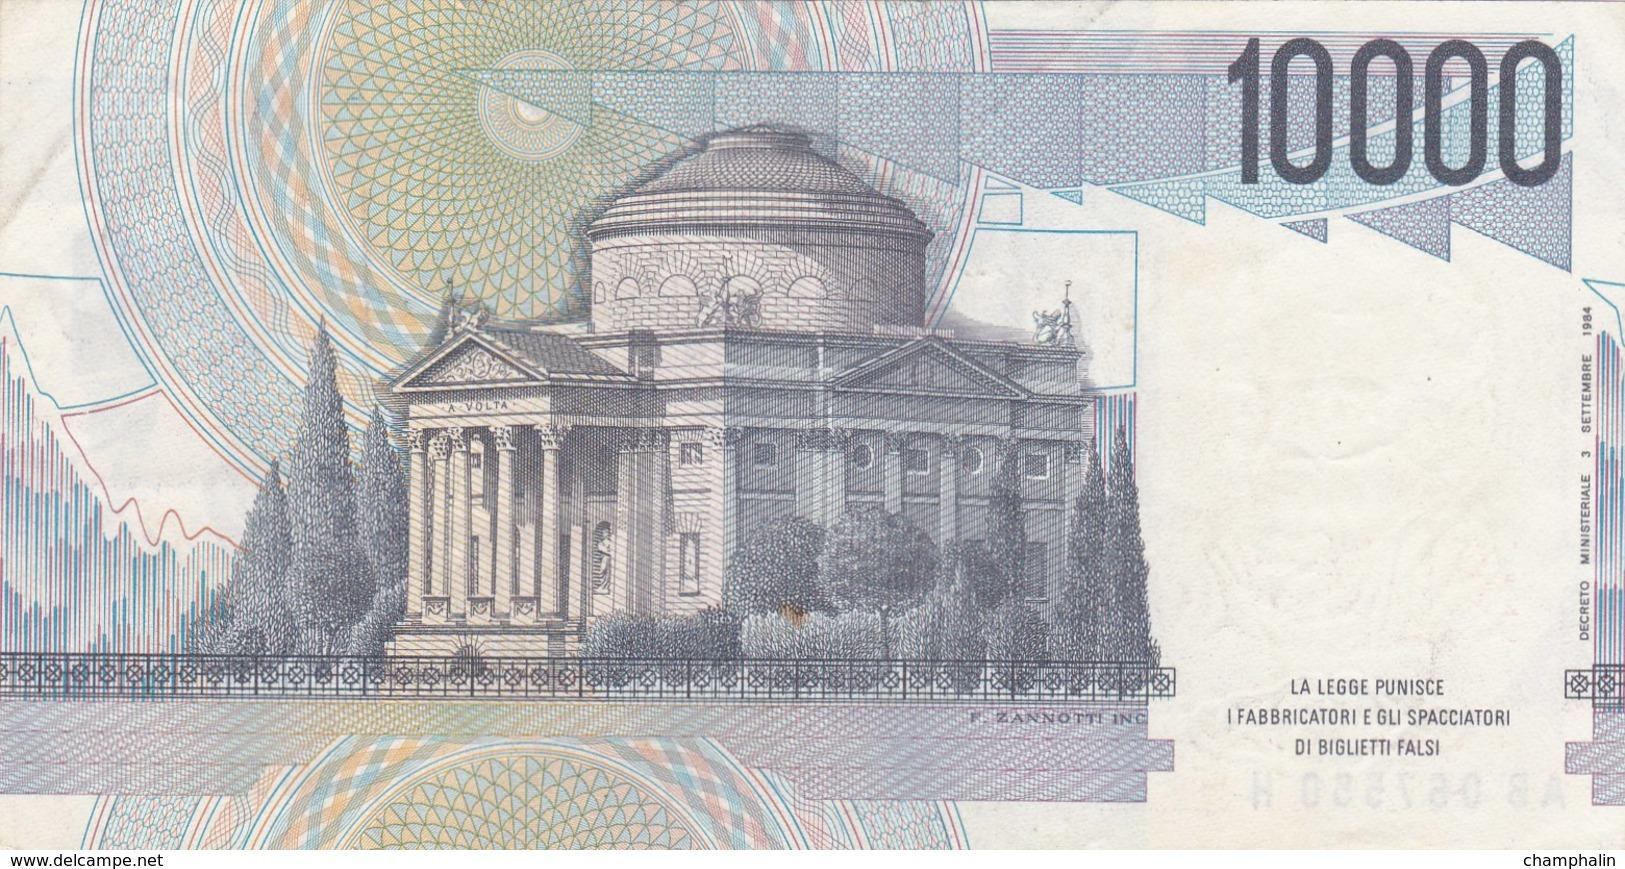 Italie - Billet De 10000 Lire - A. Volta - 3 Septembre 1984 - Presque Neuf - 10000 Lire